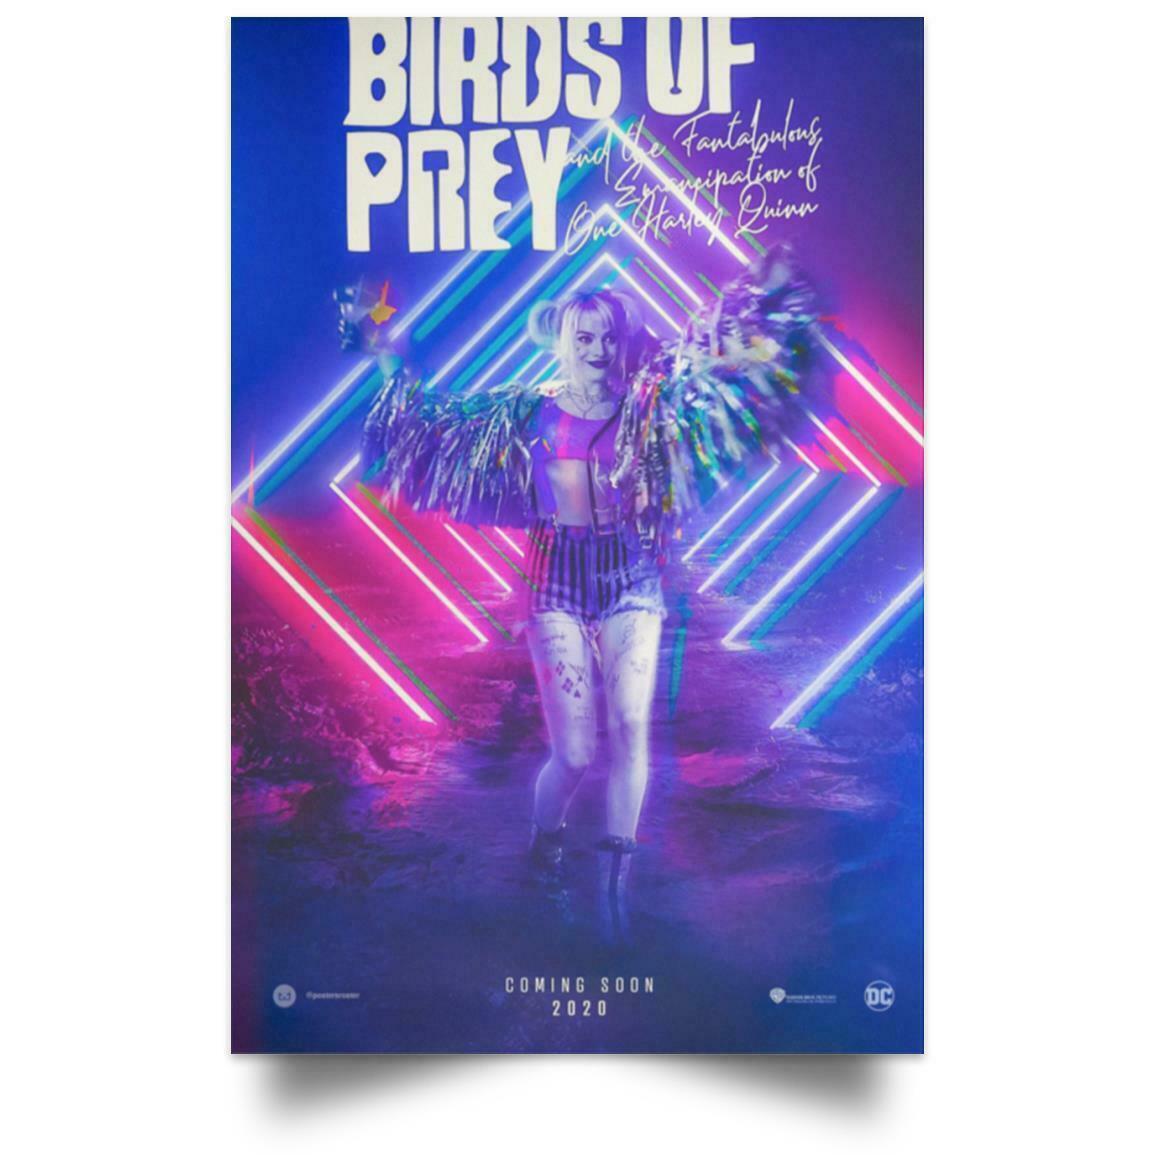 2020 Birds Of Prey Poster Harley Quinn Movie Dc Comics Wall Decor Art Silk Print Poster 889 From Lyshop007 13 26 Dhgate Com